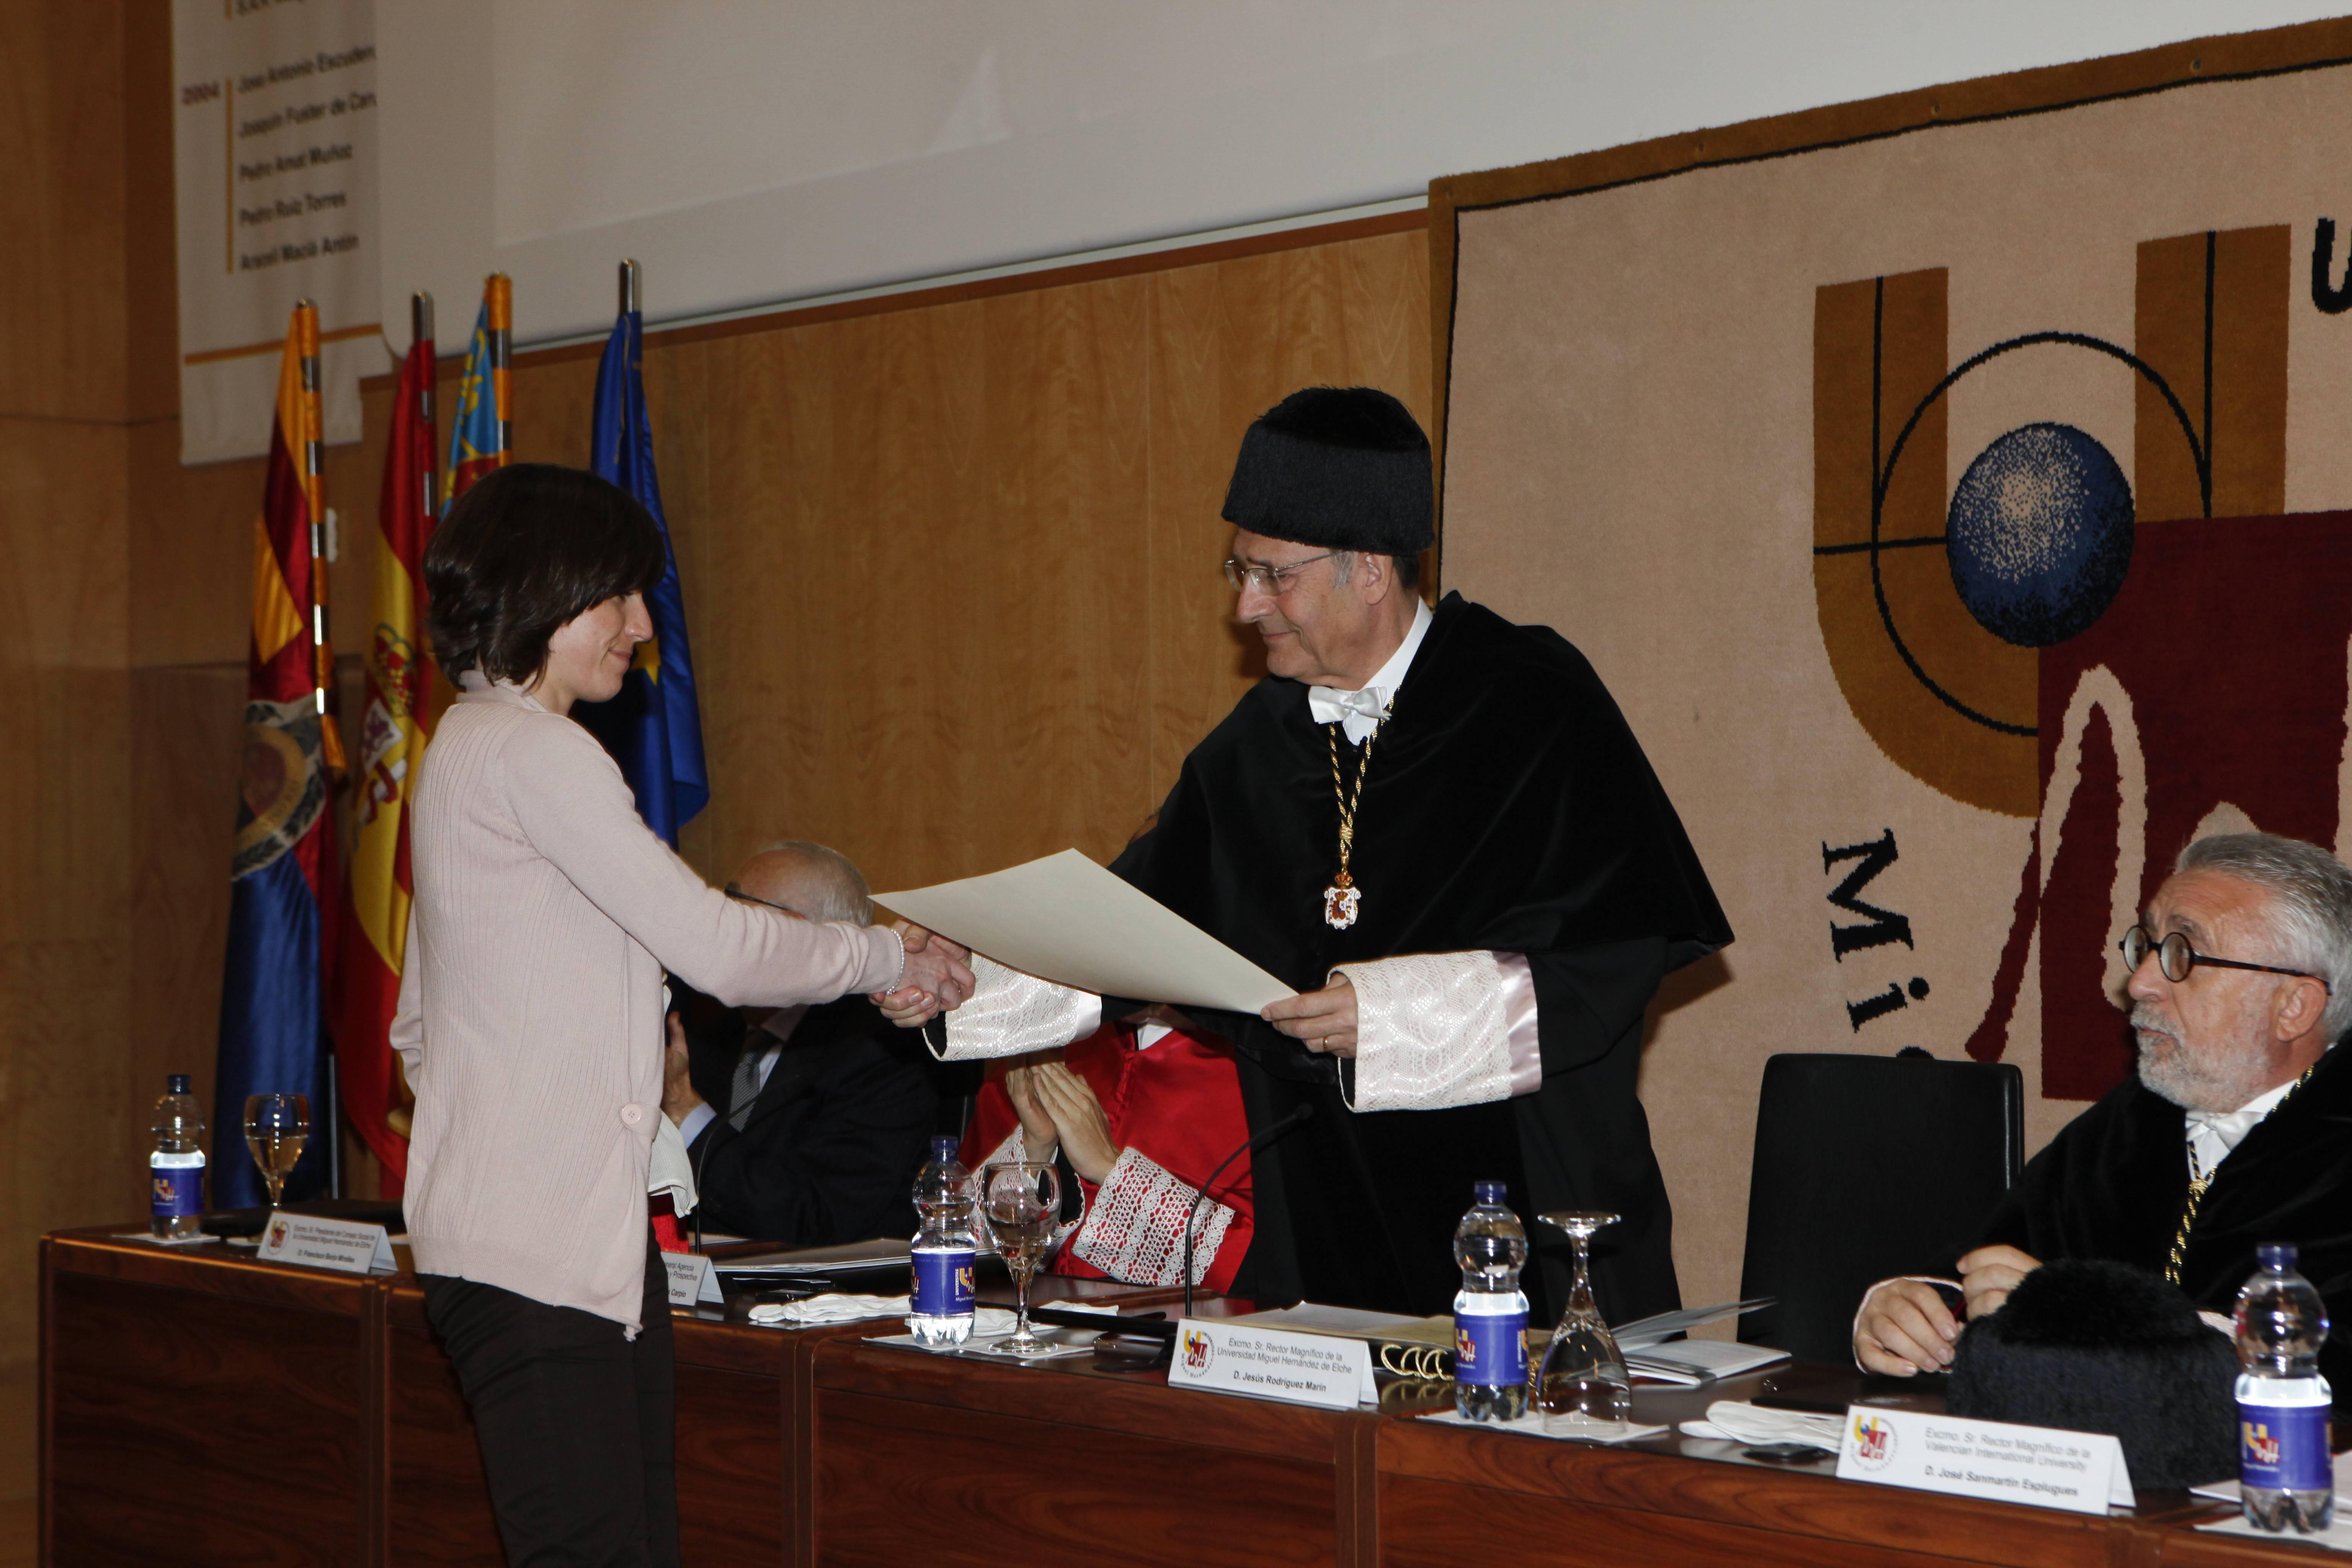 doctor-honoris-causa-luis-gamir_mg_1057.jpg